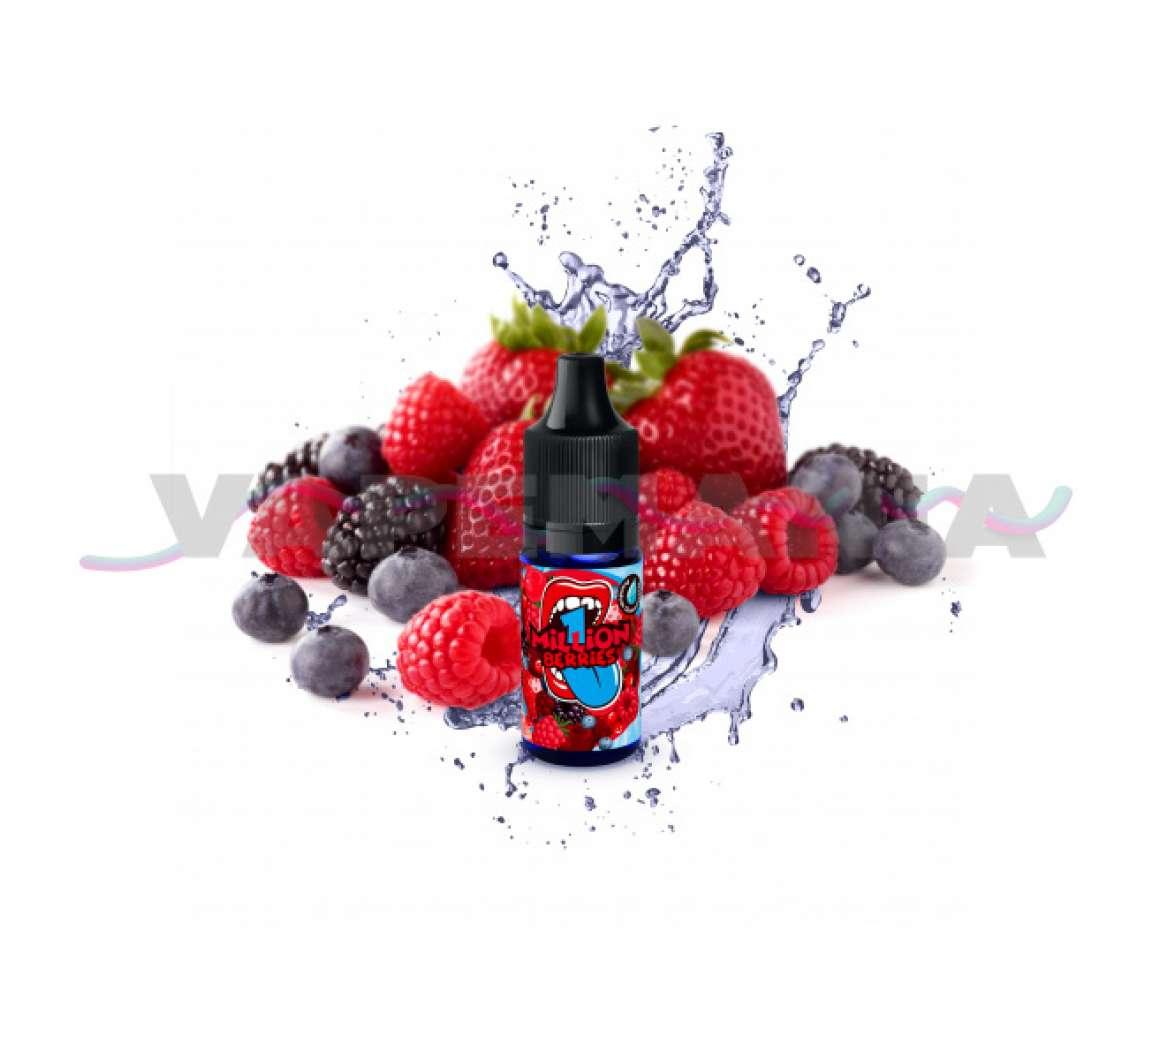 Big Mouth Classic - Směs lesních plodů (One Milion Berries) 10ml